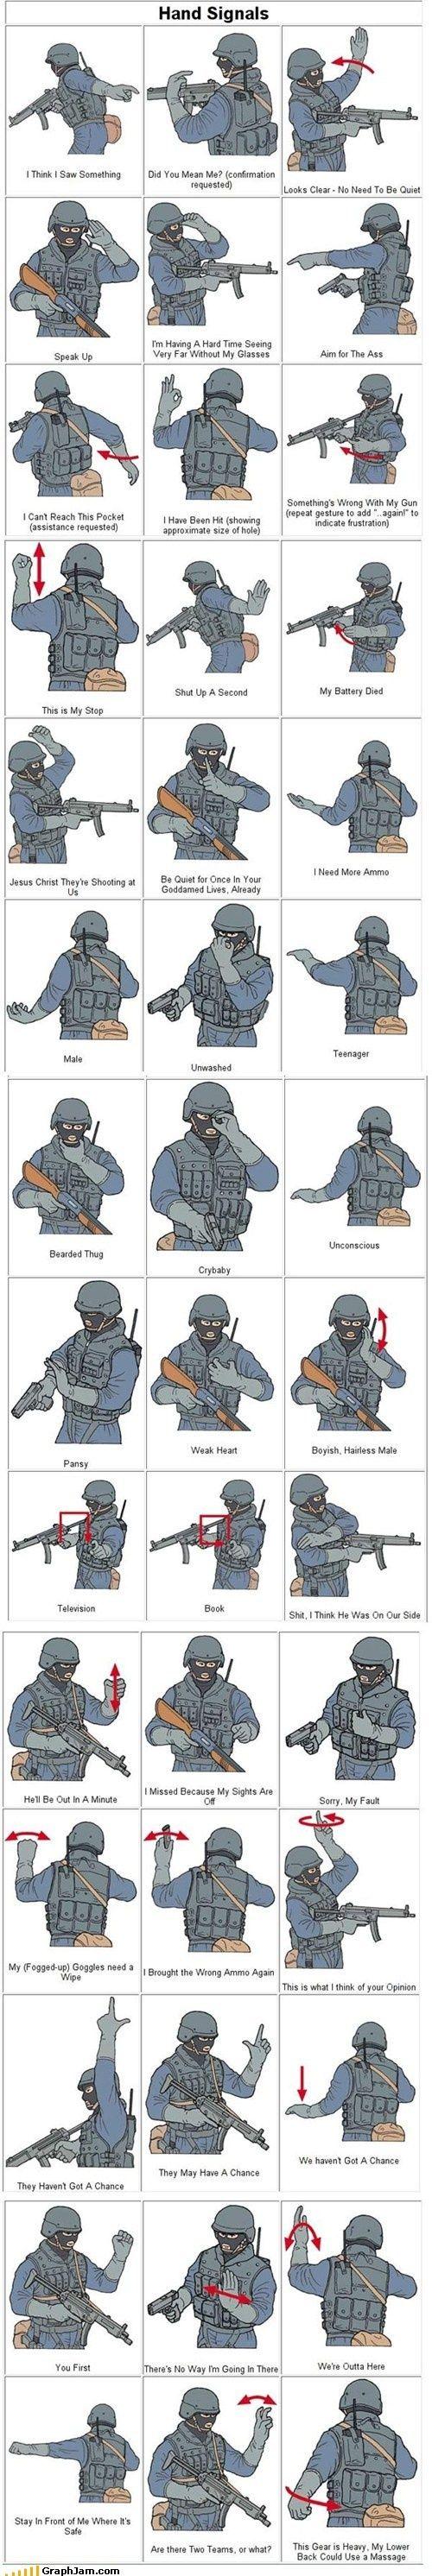 SWAT hand signal.... - http://www.survivalacademy.co/